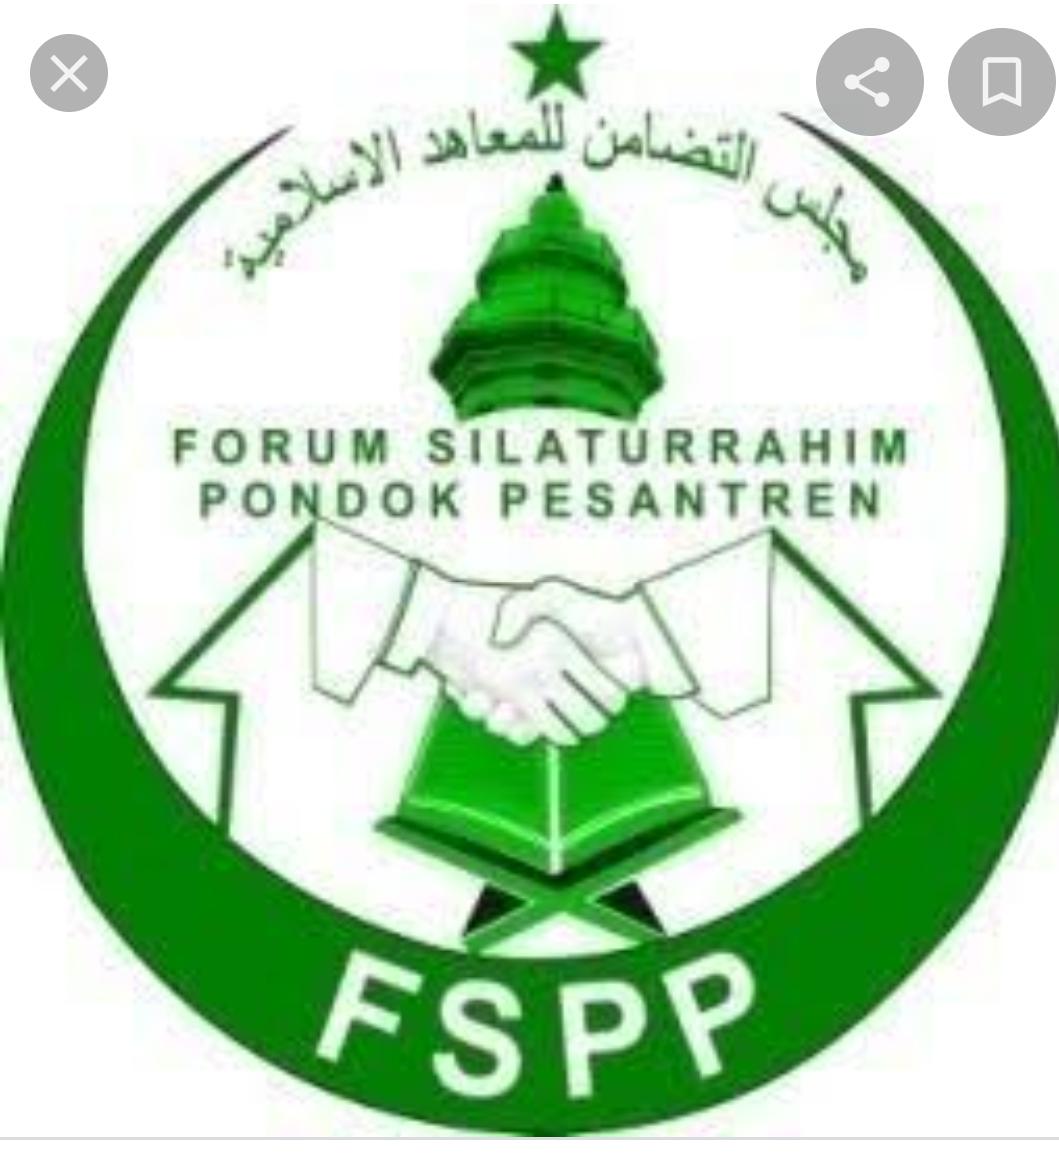 Gambar Pasca Ditetapkan Pimpinan Ponpes di Labuan Sebagai Tersangka, Ini Pernyataan Sikap Dari Gabungan FSPP Se- Provinsi Banten 13